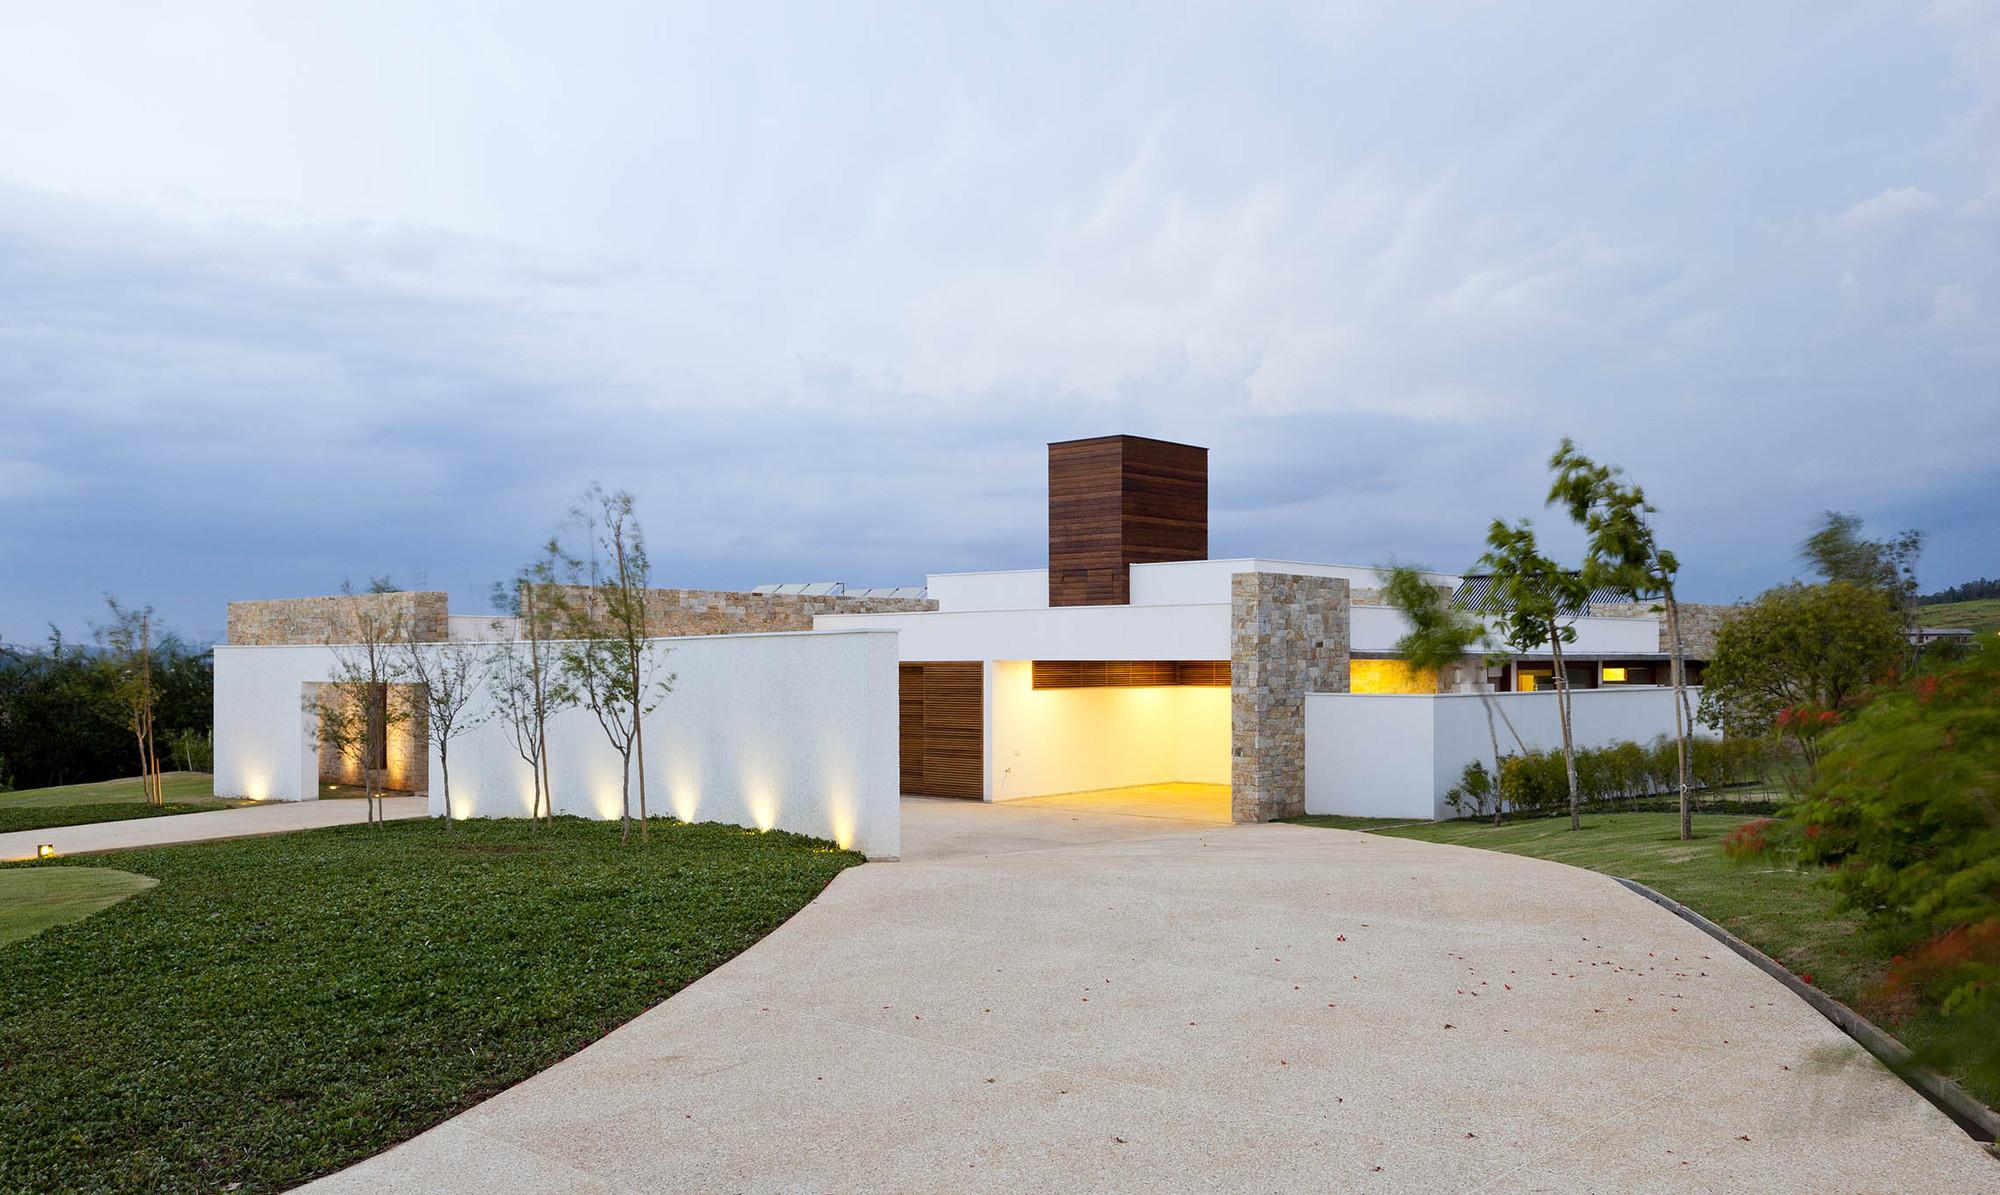 Residência da Grama / Vasco Lopes Arquitetura, © Maira Acayaba